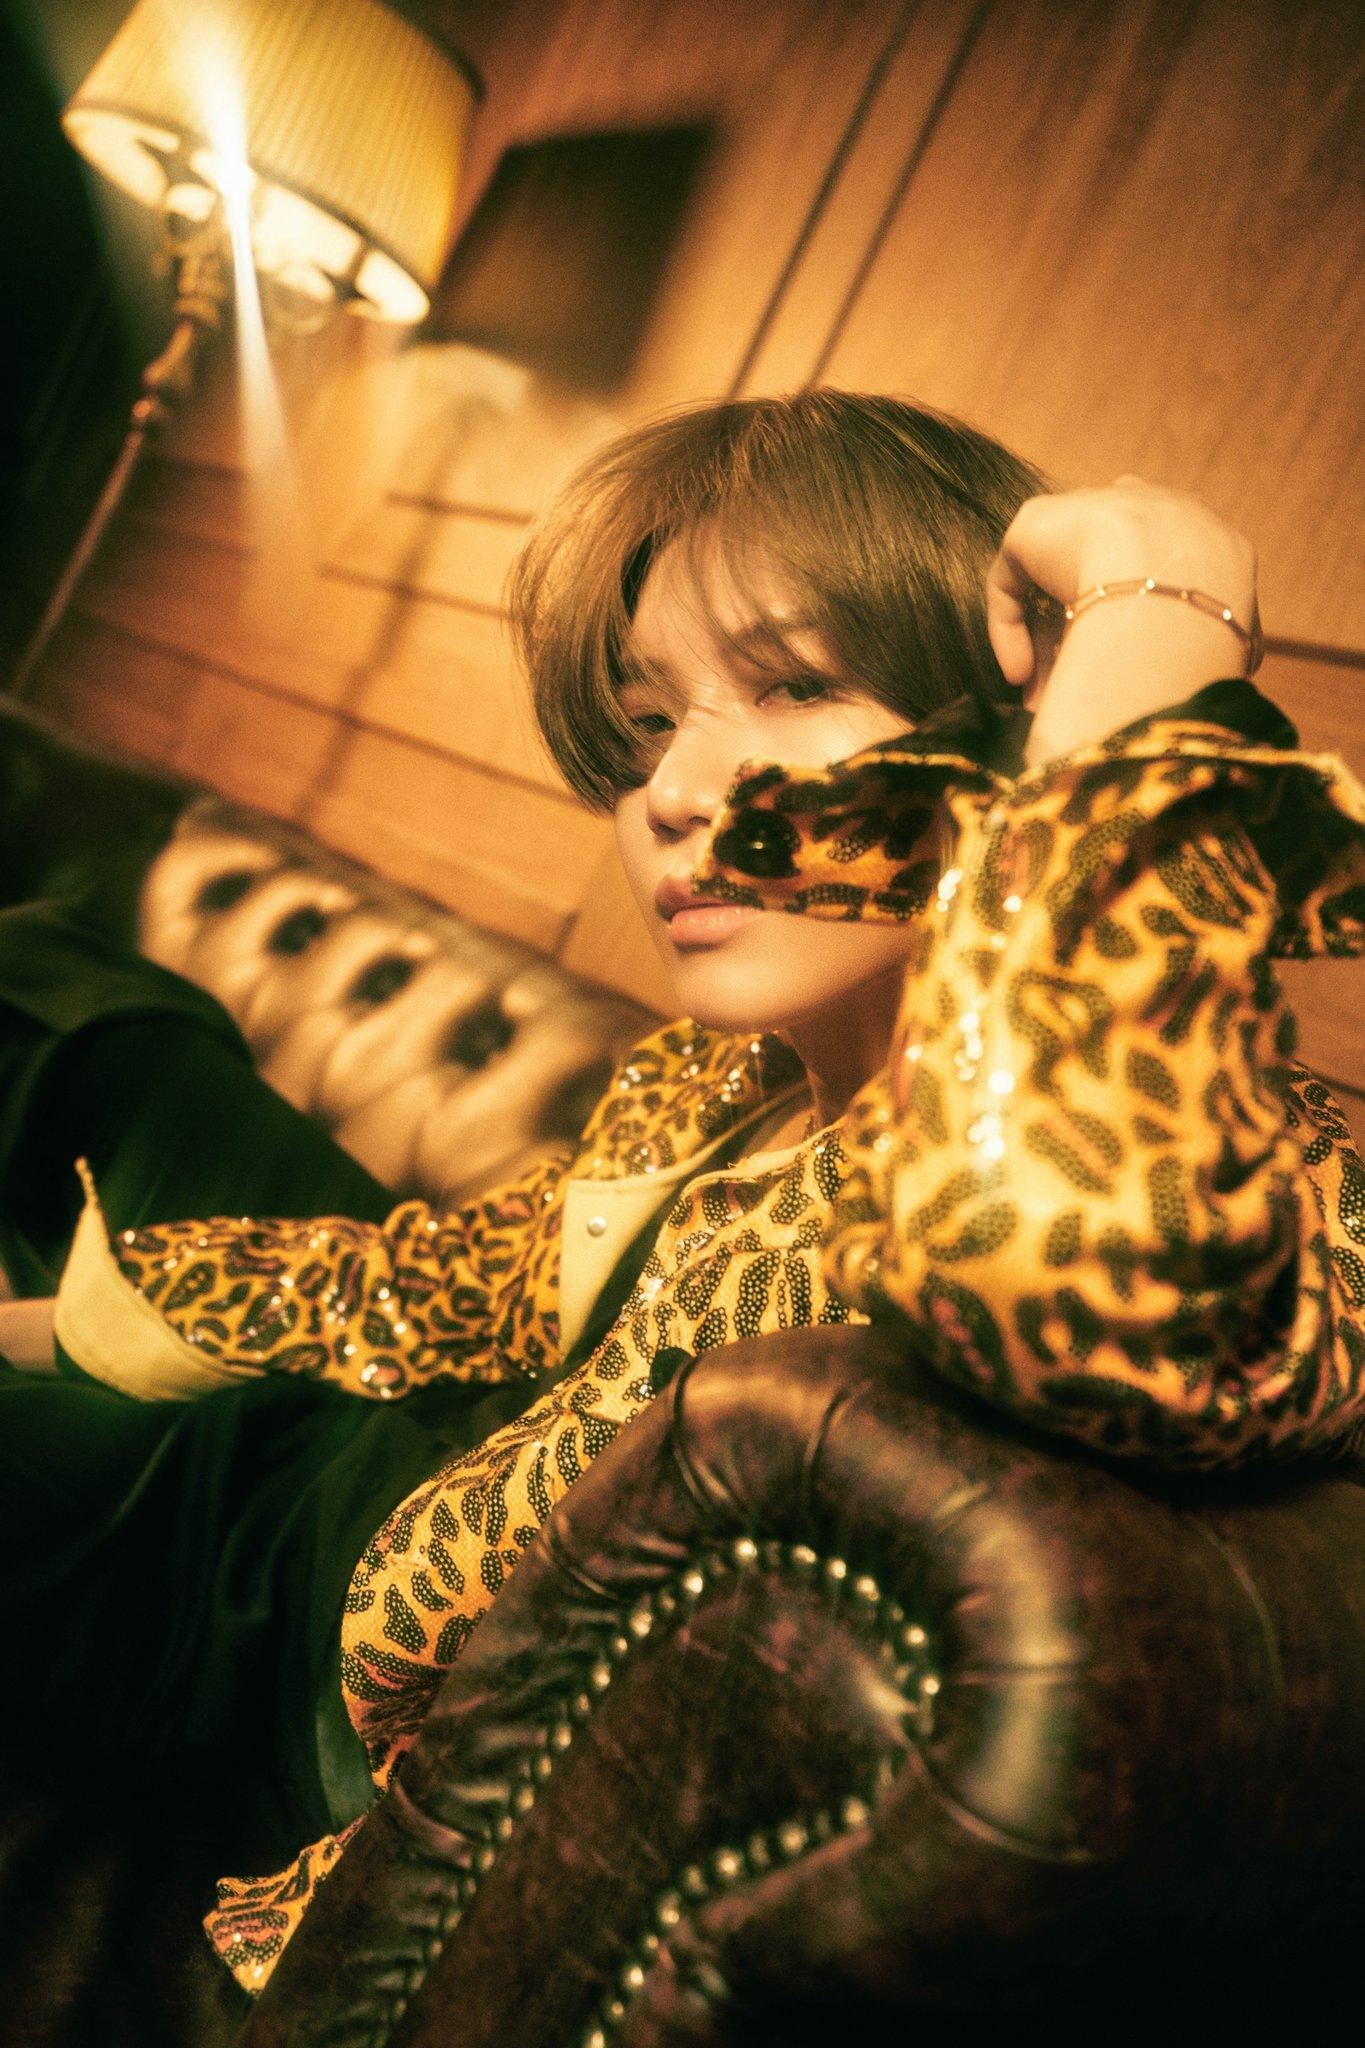 TAEMIN for The 2nd Mini Album WANT - Lee Taemin Photo